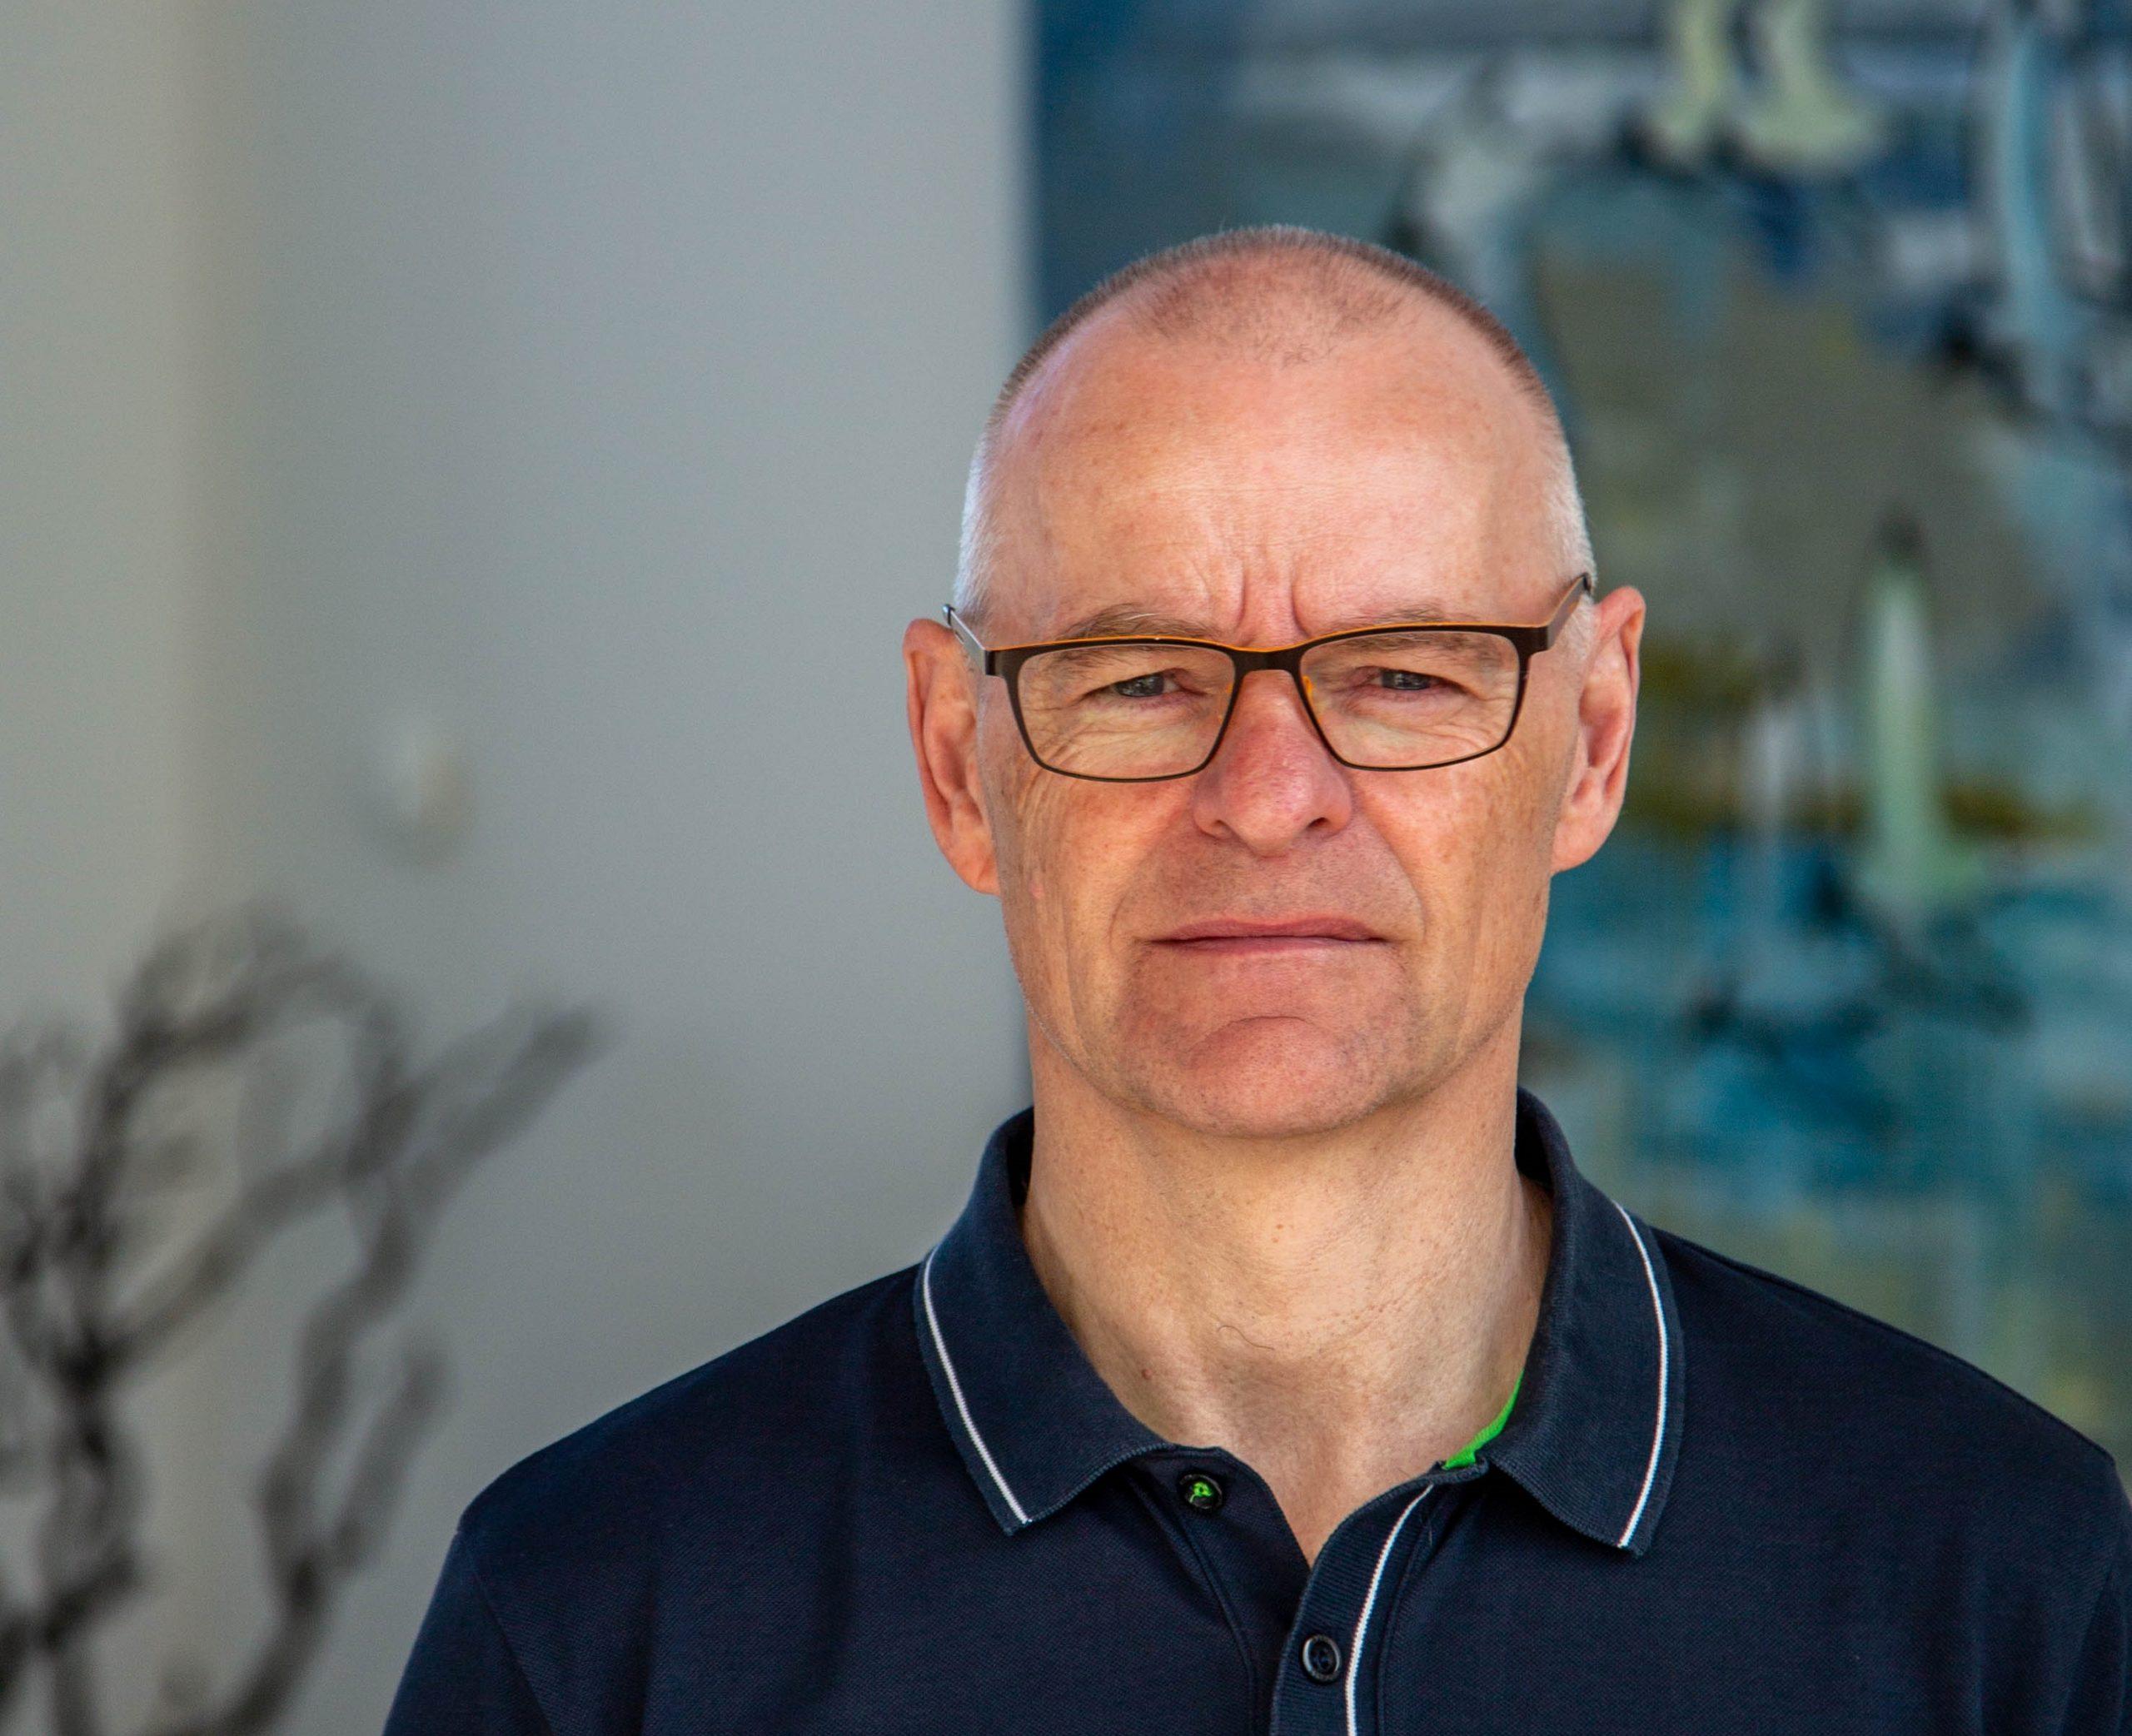 Finn Steffensen, ejer af vestjyske Nymindegab Kro, er ny bestyrelsesformand for Small Danish Hotels. Pressefoto via Small Danish Hotels.